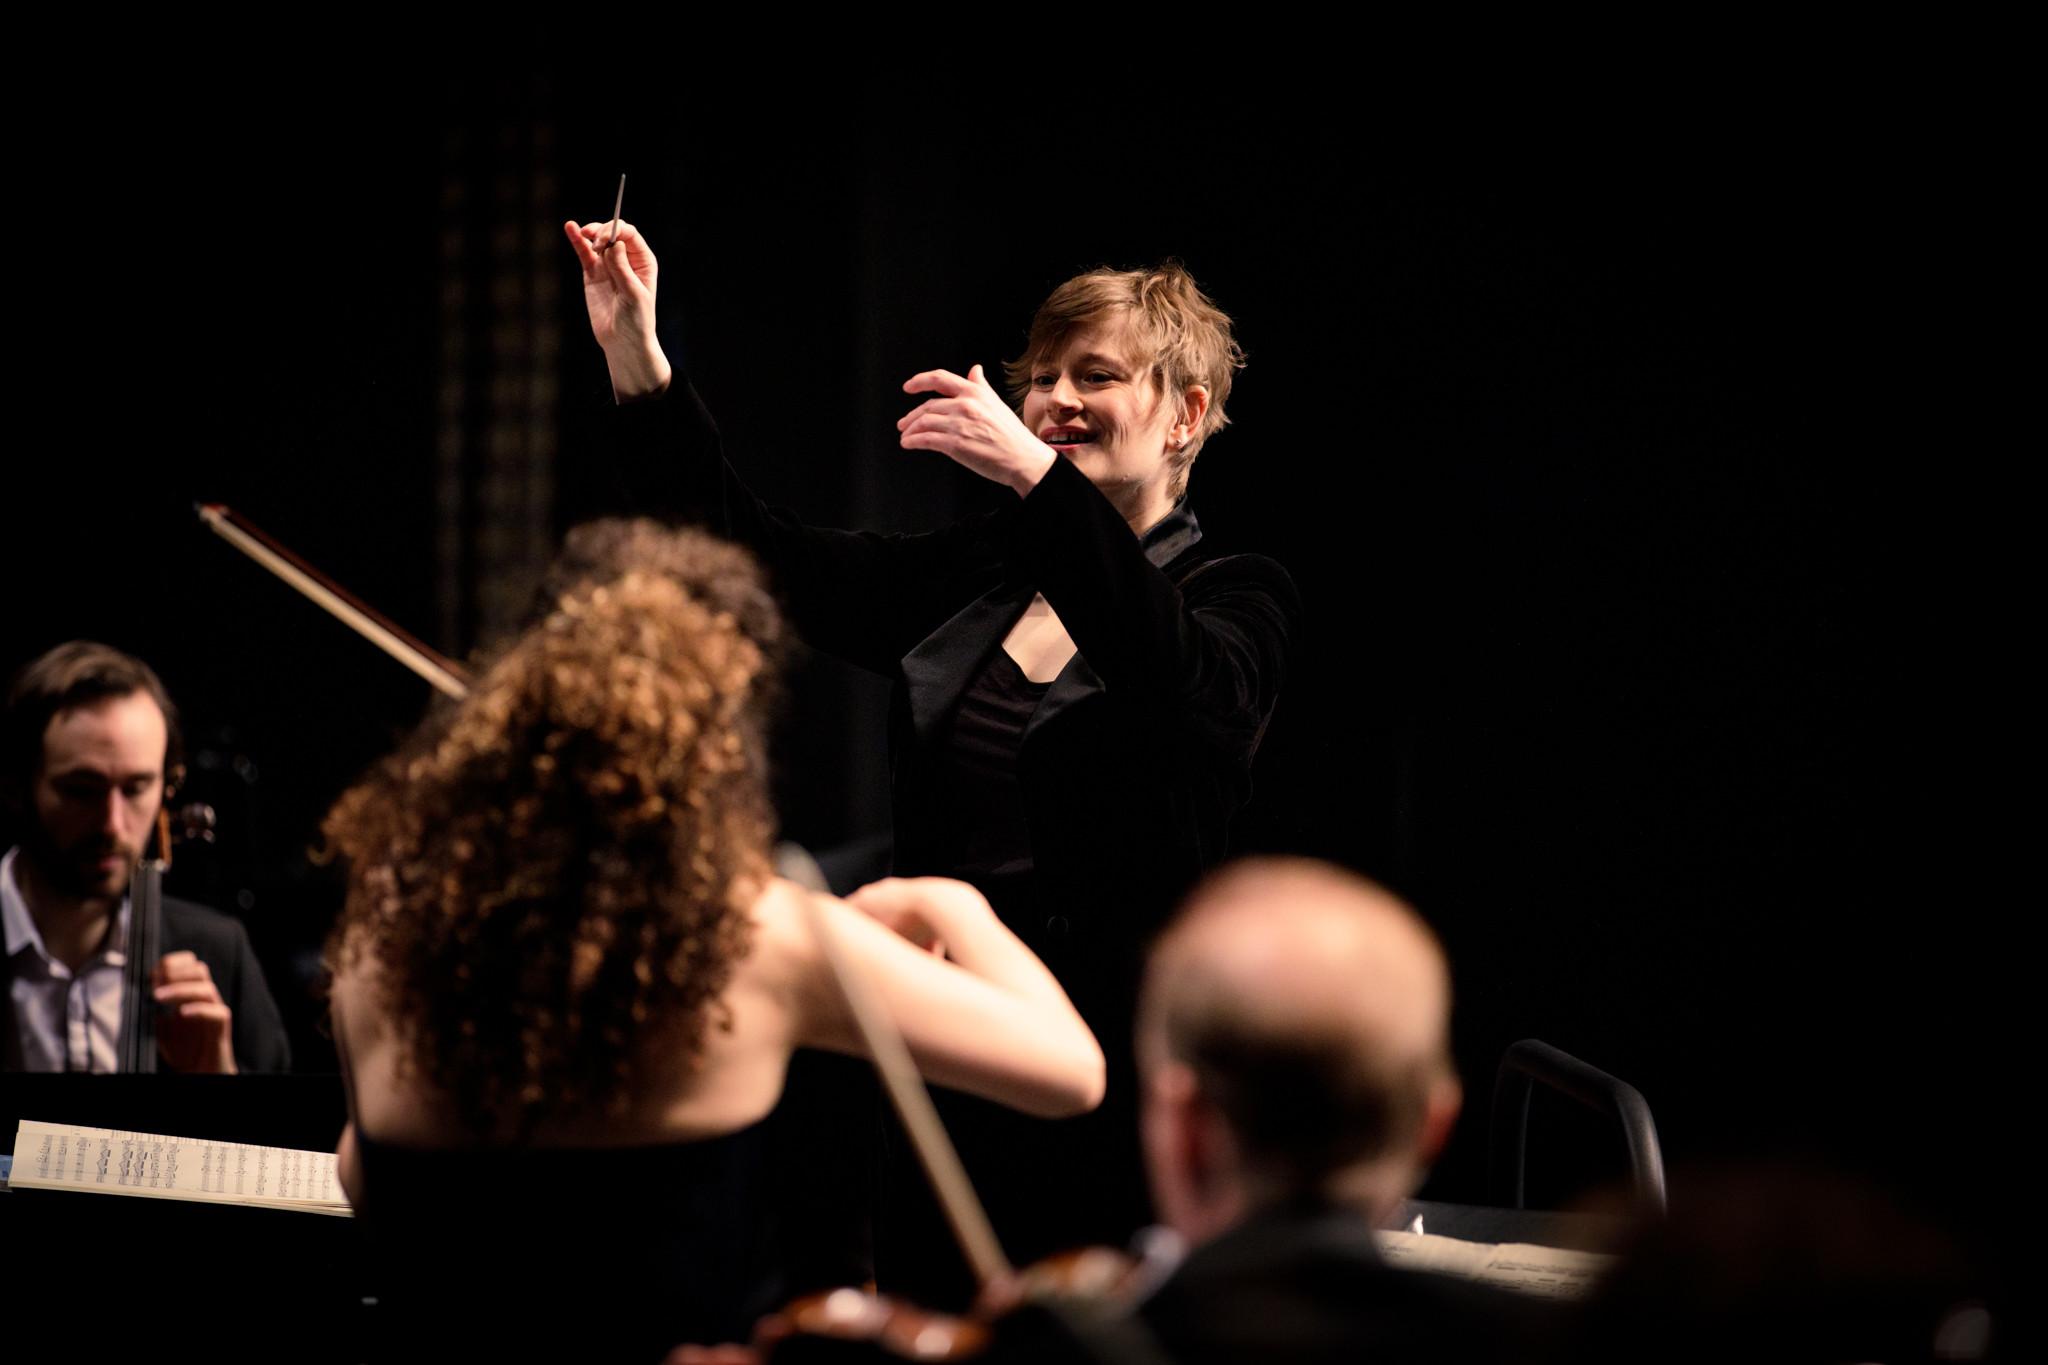 https://ams3.digitaloceanspaces.com/residentie-orkest-preview/assets/Making a Maestro